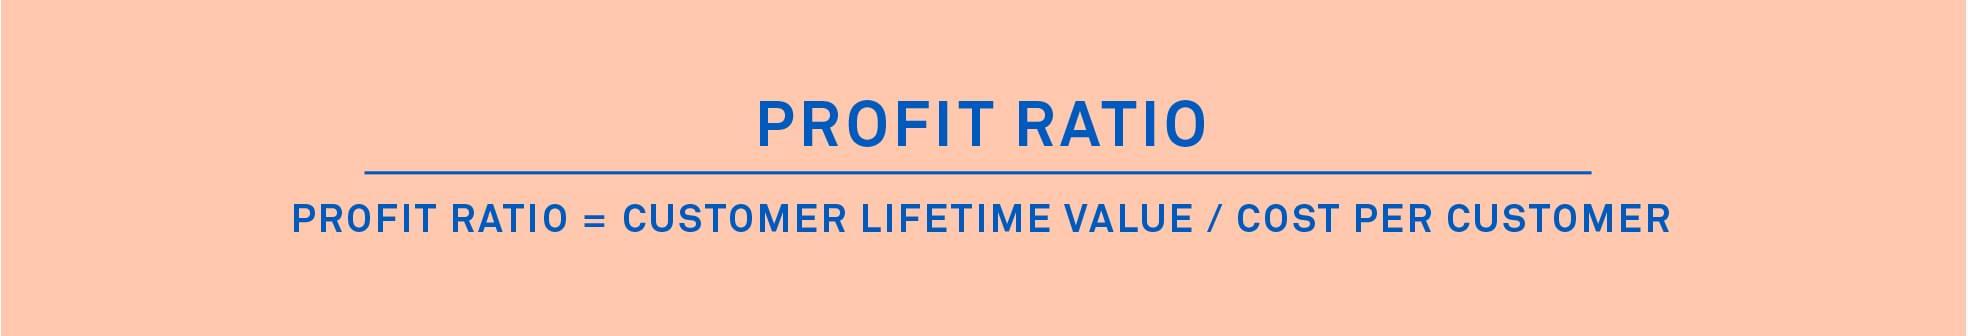 Profit Ratio formula